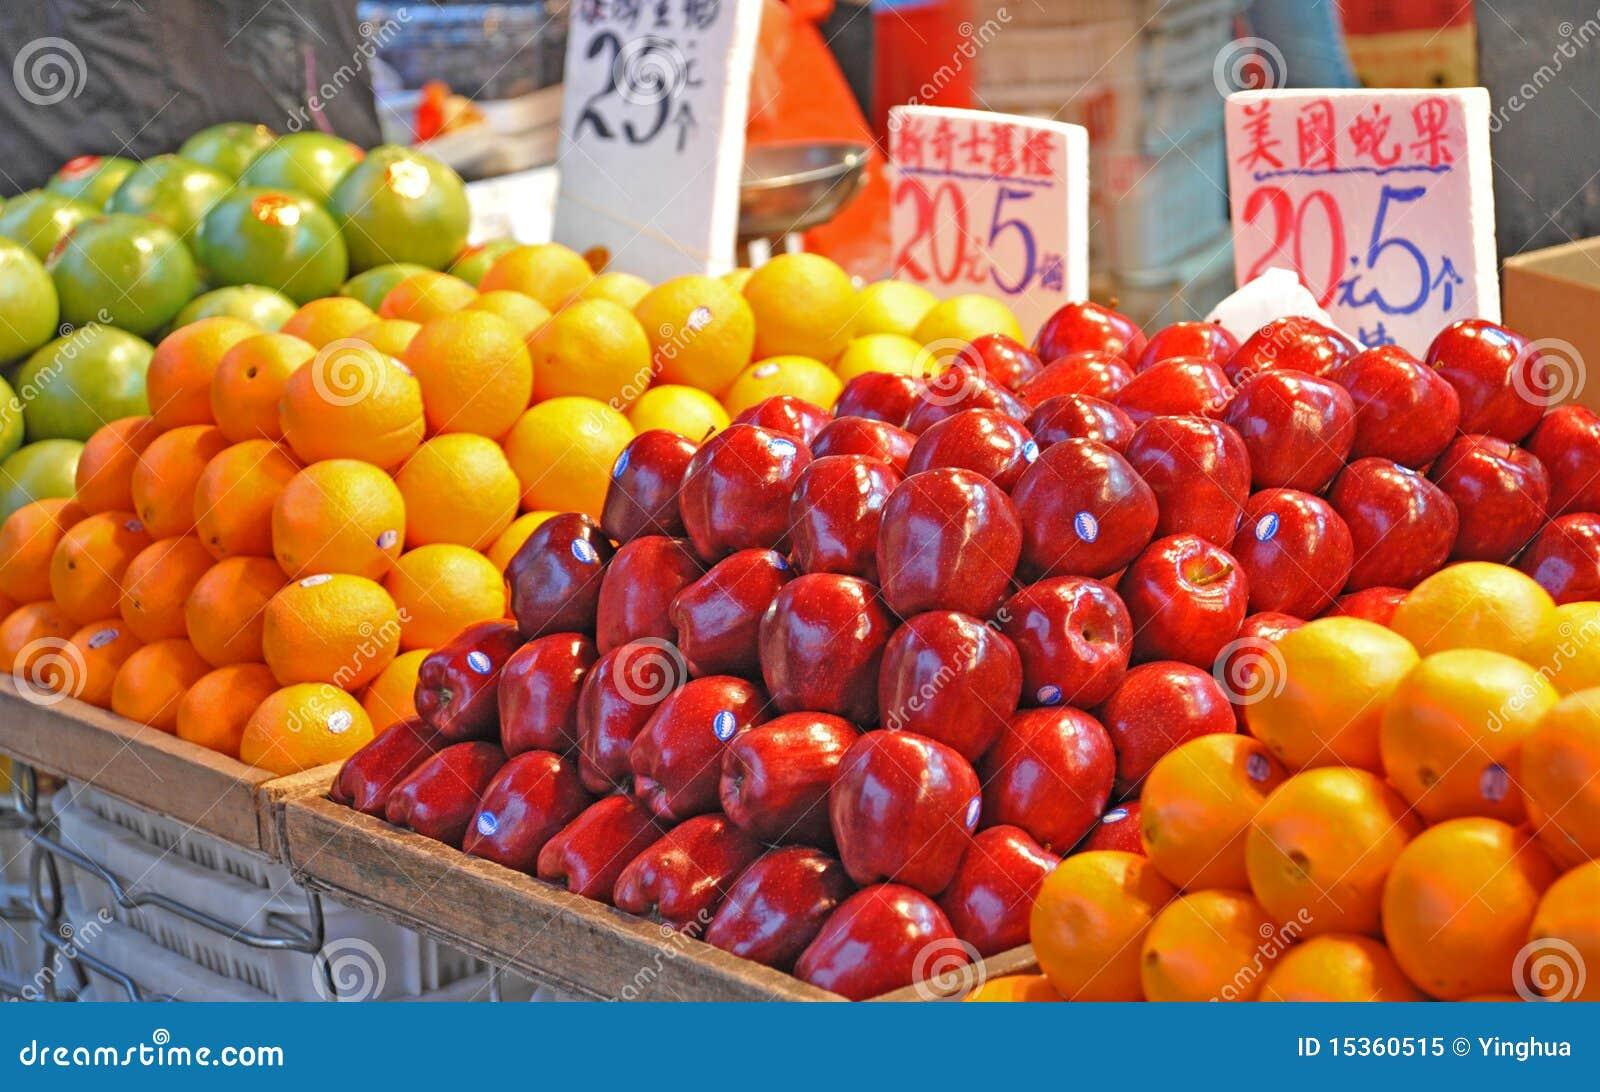 Fruit Stall Royalty Free Stock Photo - Image: 15360515